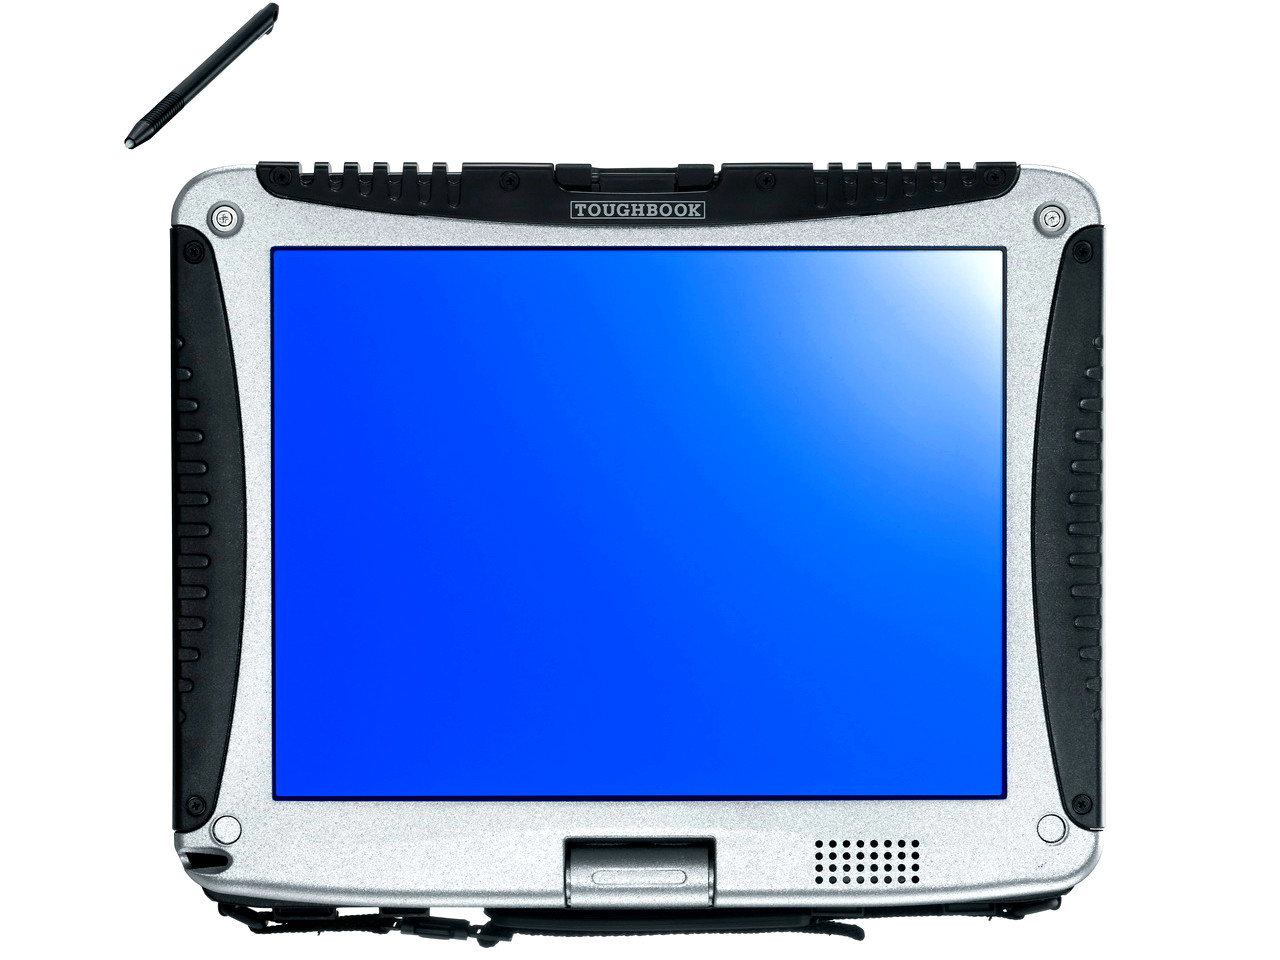 Panasonic Toughbook CF-19 MK5 Core i5-2520M